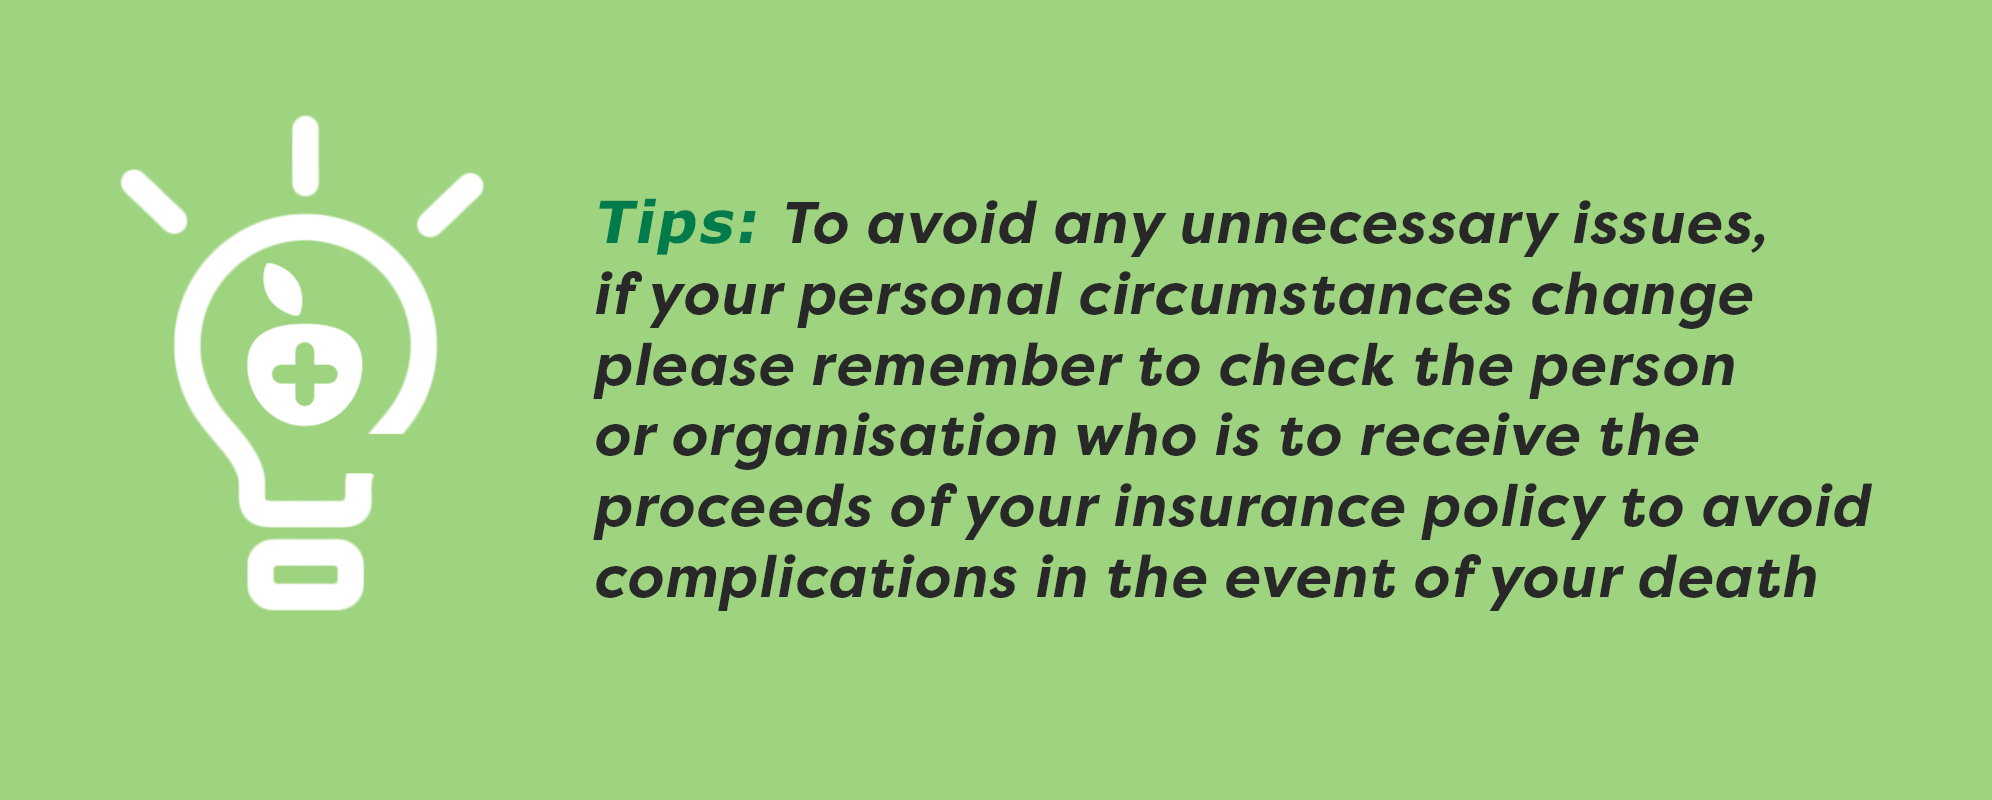 life insurance tip 3-1